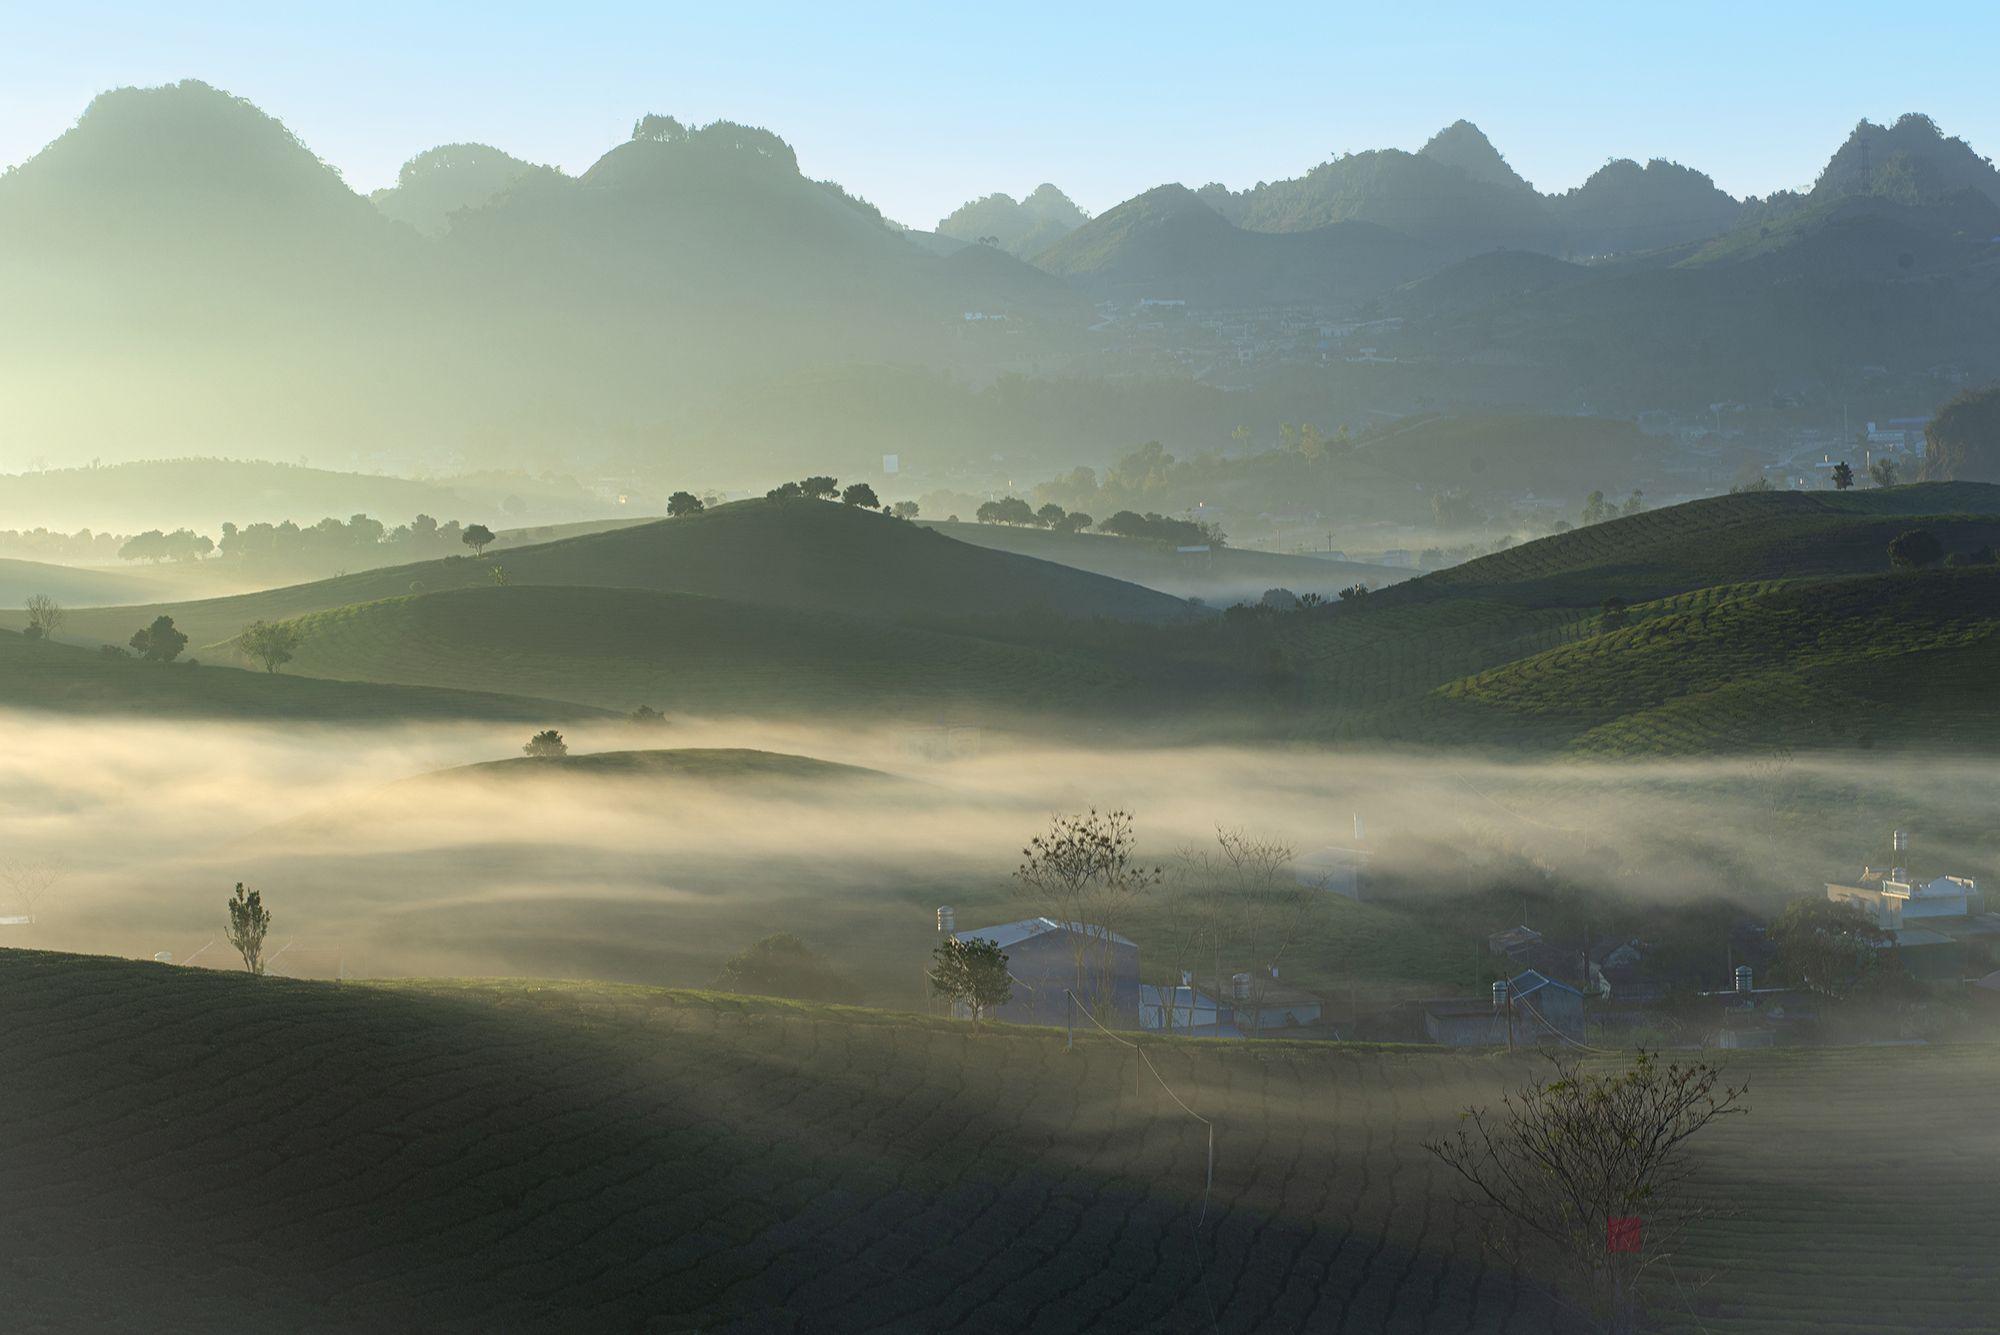 , Nhat Quang Le